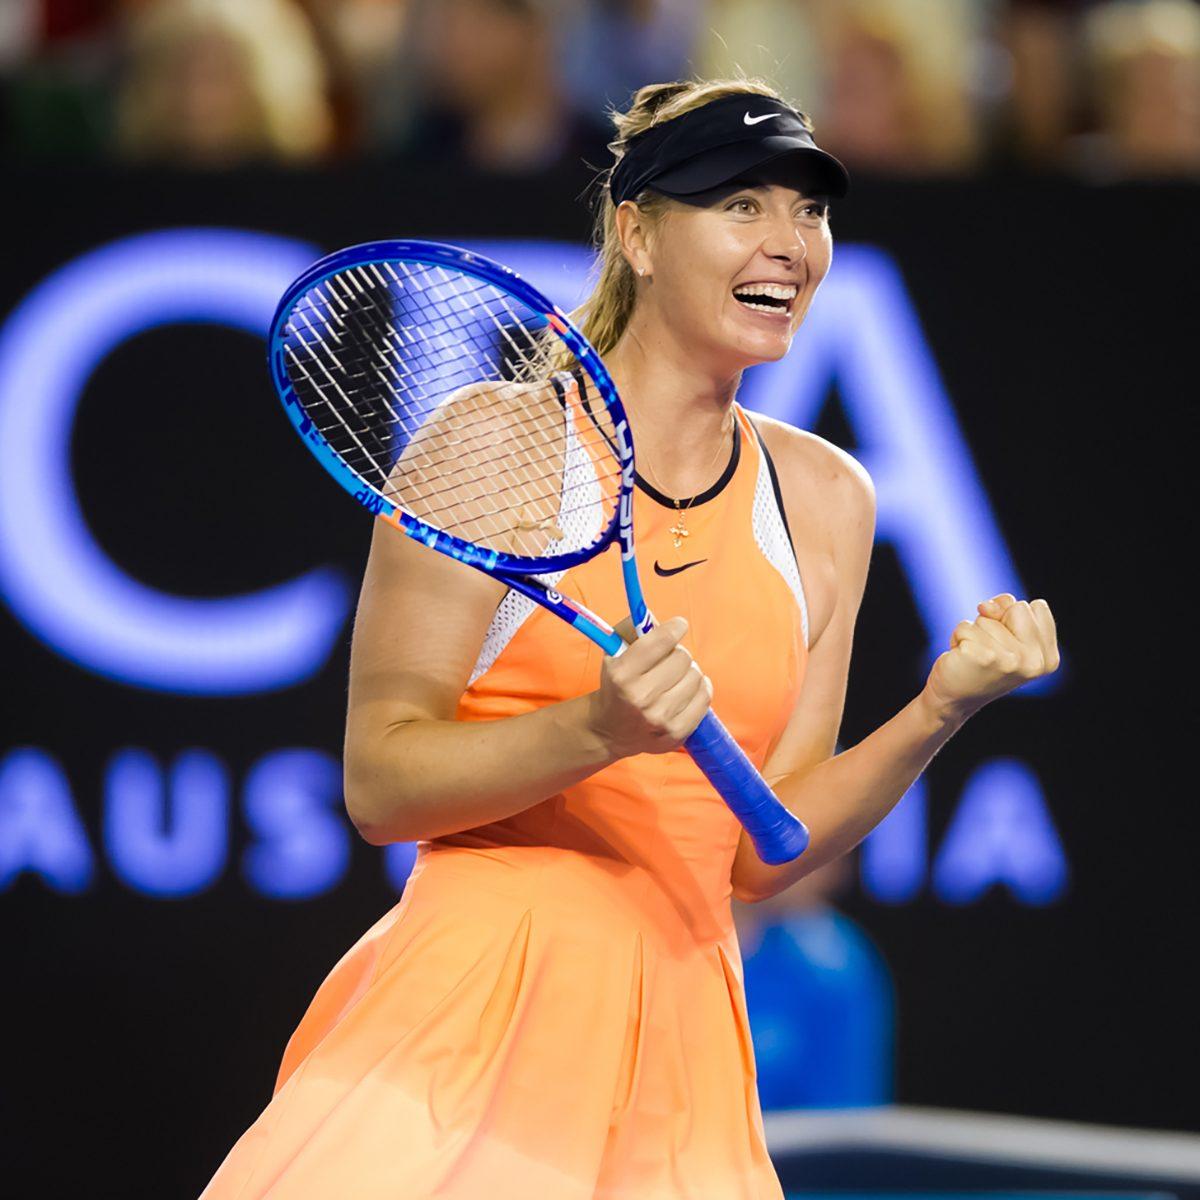 Maria Sharapova in action at the 2016 Australian Open